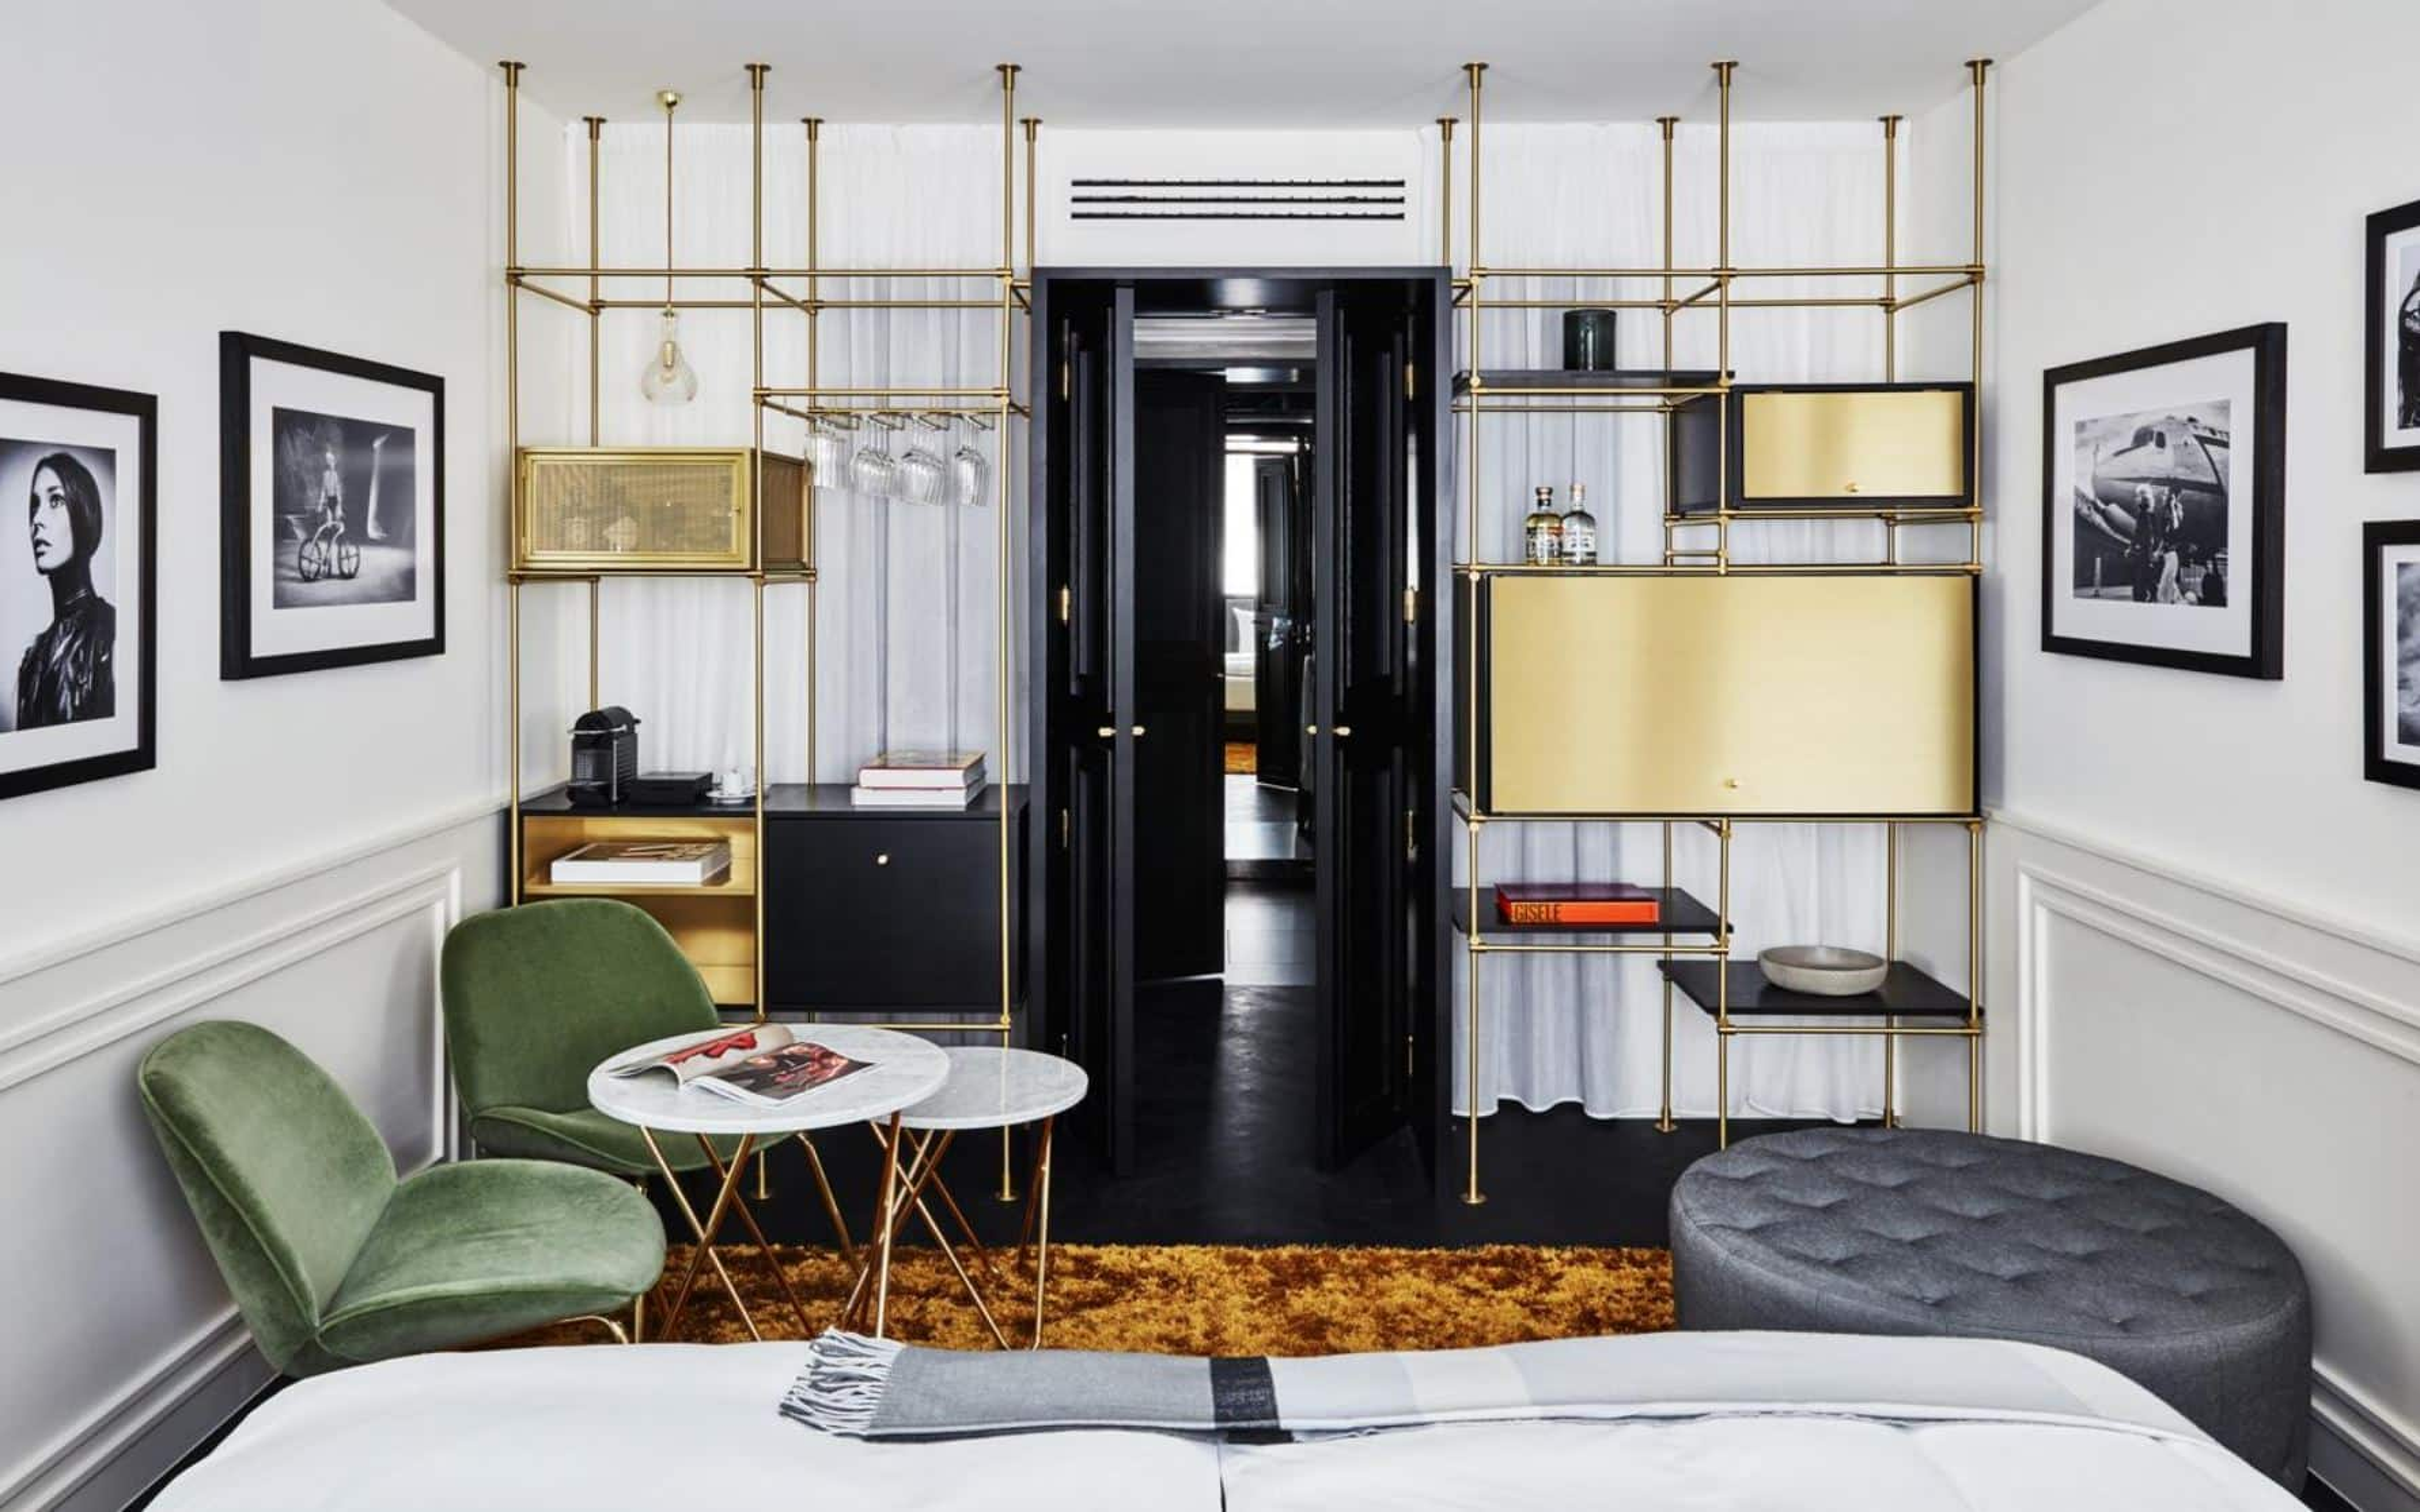 Roomers Hotel in Munich